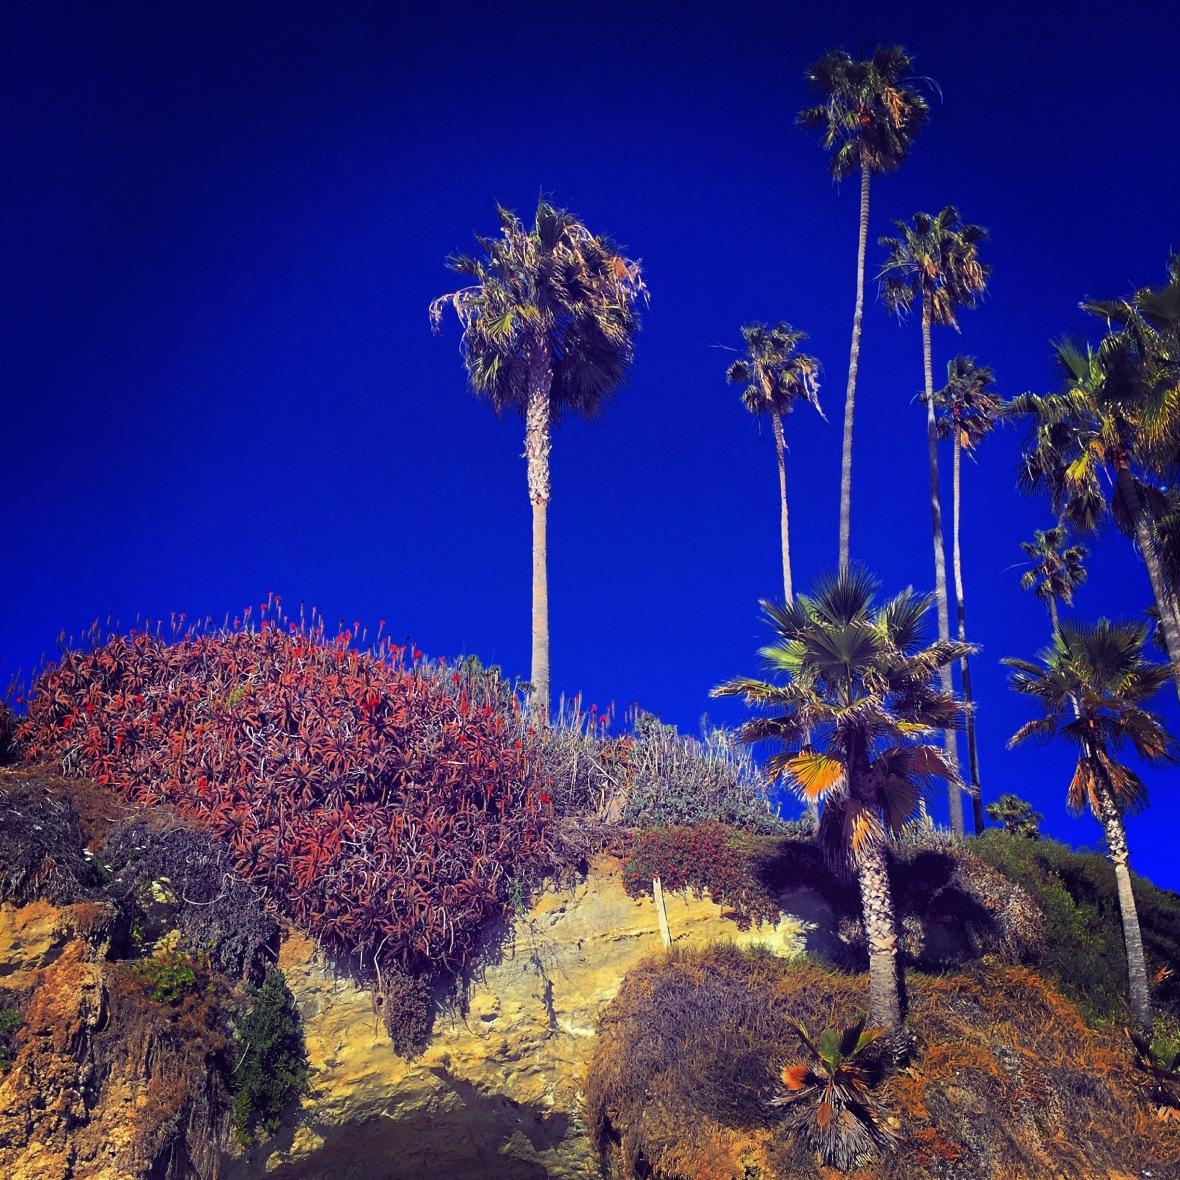 """Upon the Hill, the Sea Below"" (Laguna Beach, CA)"